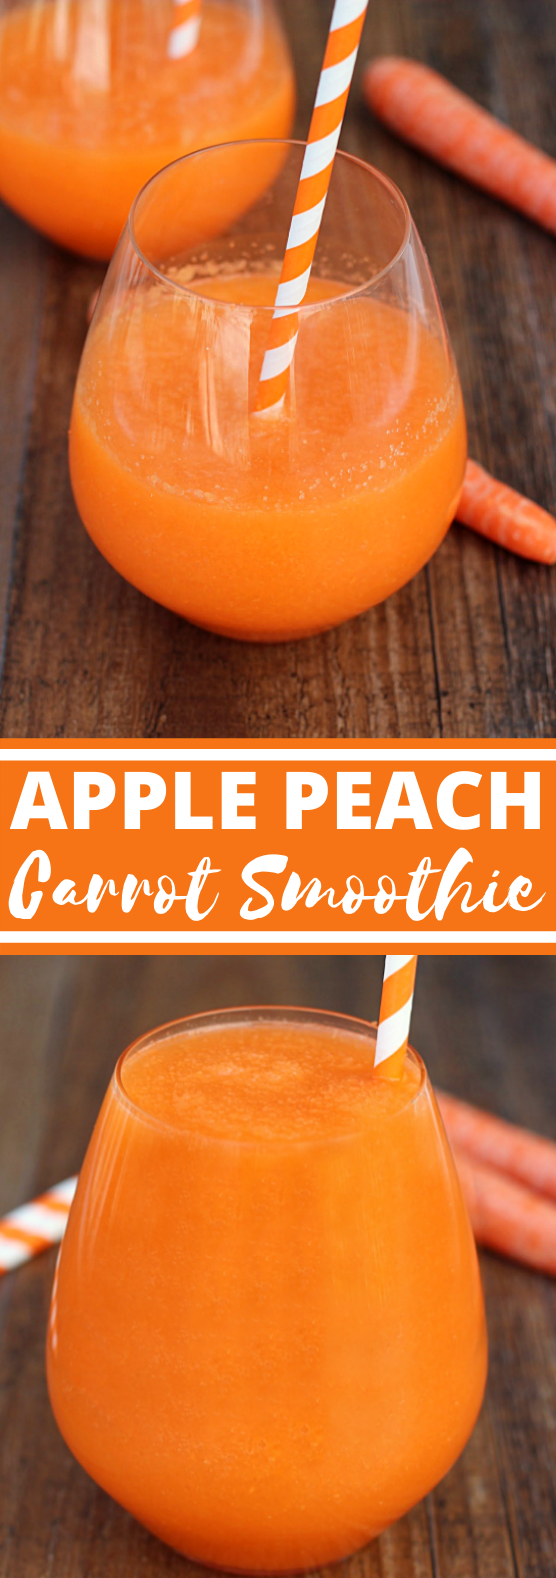 Apple Peach Carrot Smoothie #healthy #drink #breakfast #smoothie #juice